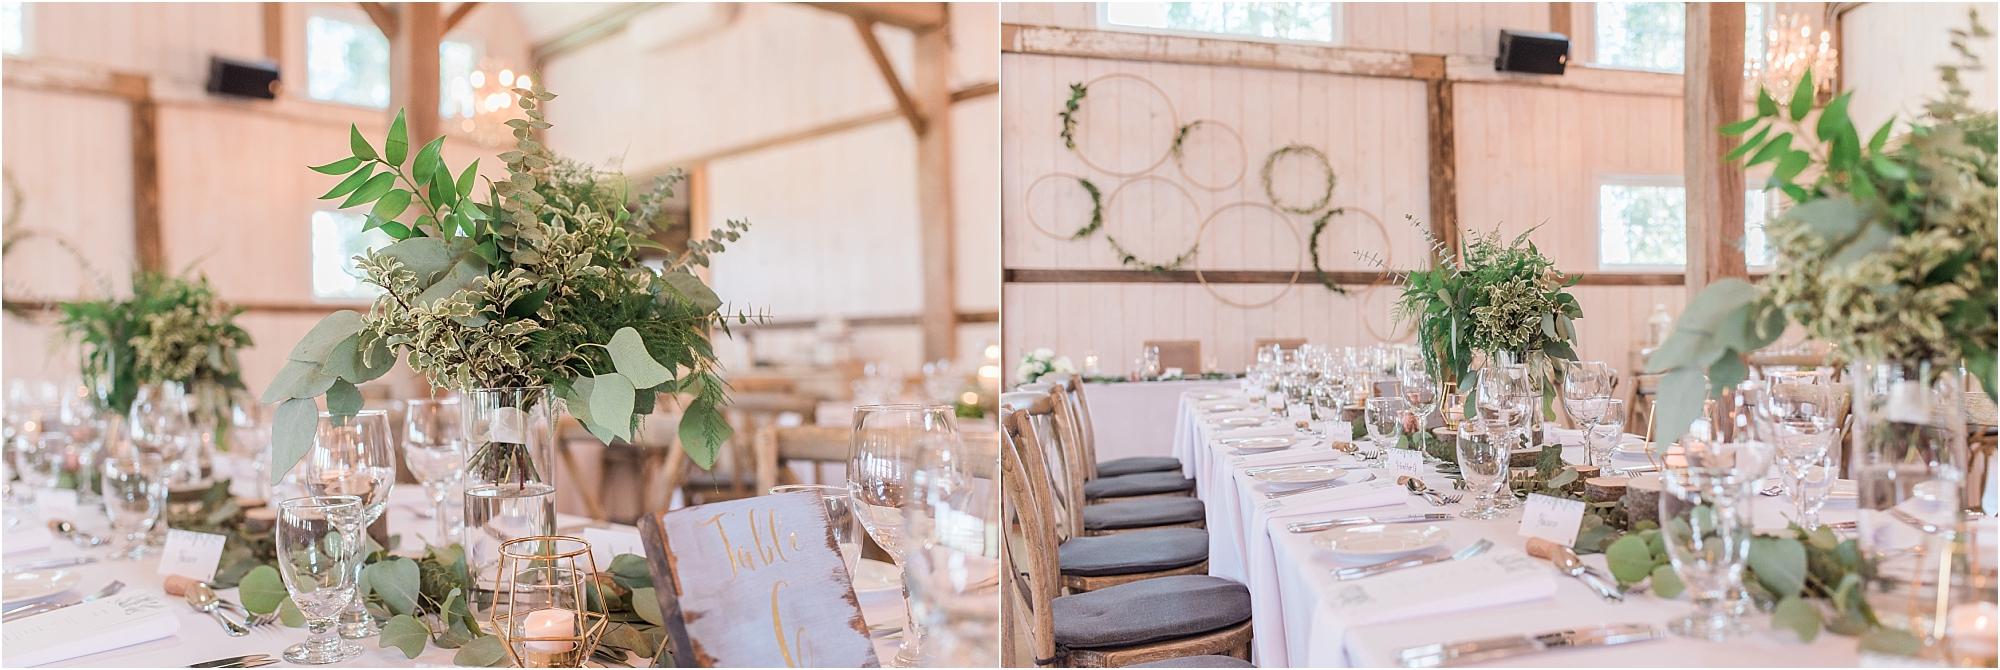 0077 Summer Stonefields Wedding Carleton Place - Ottawa Wedding - Photography by Emma_WEB.jpg